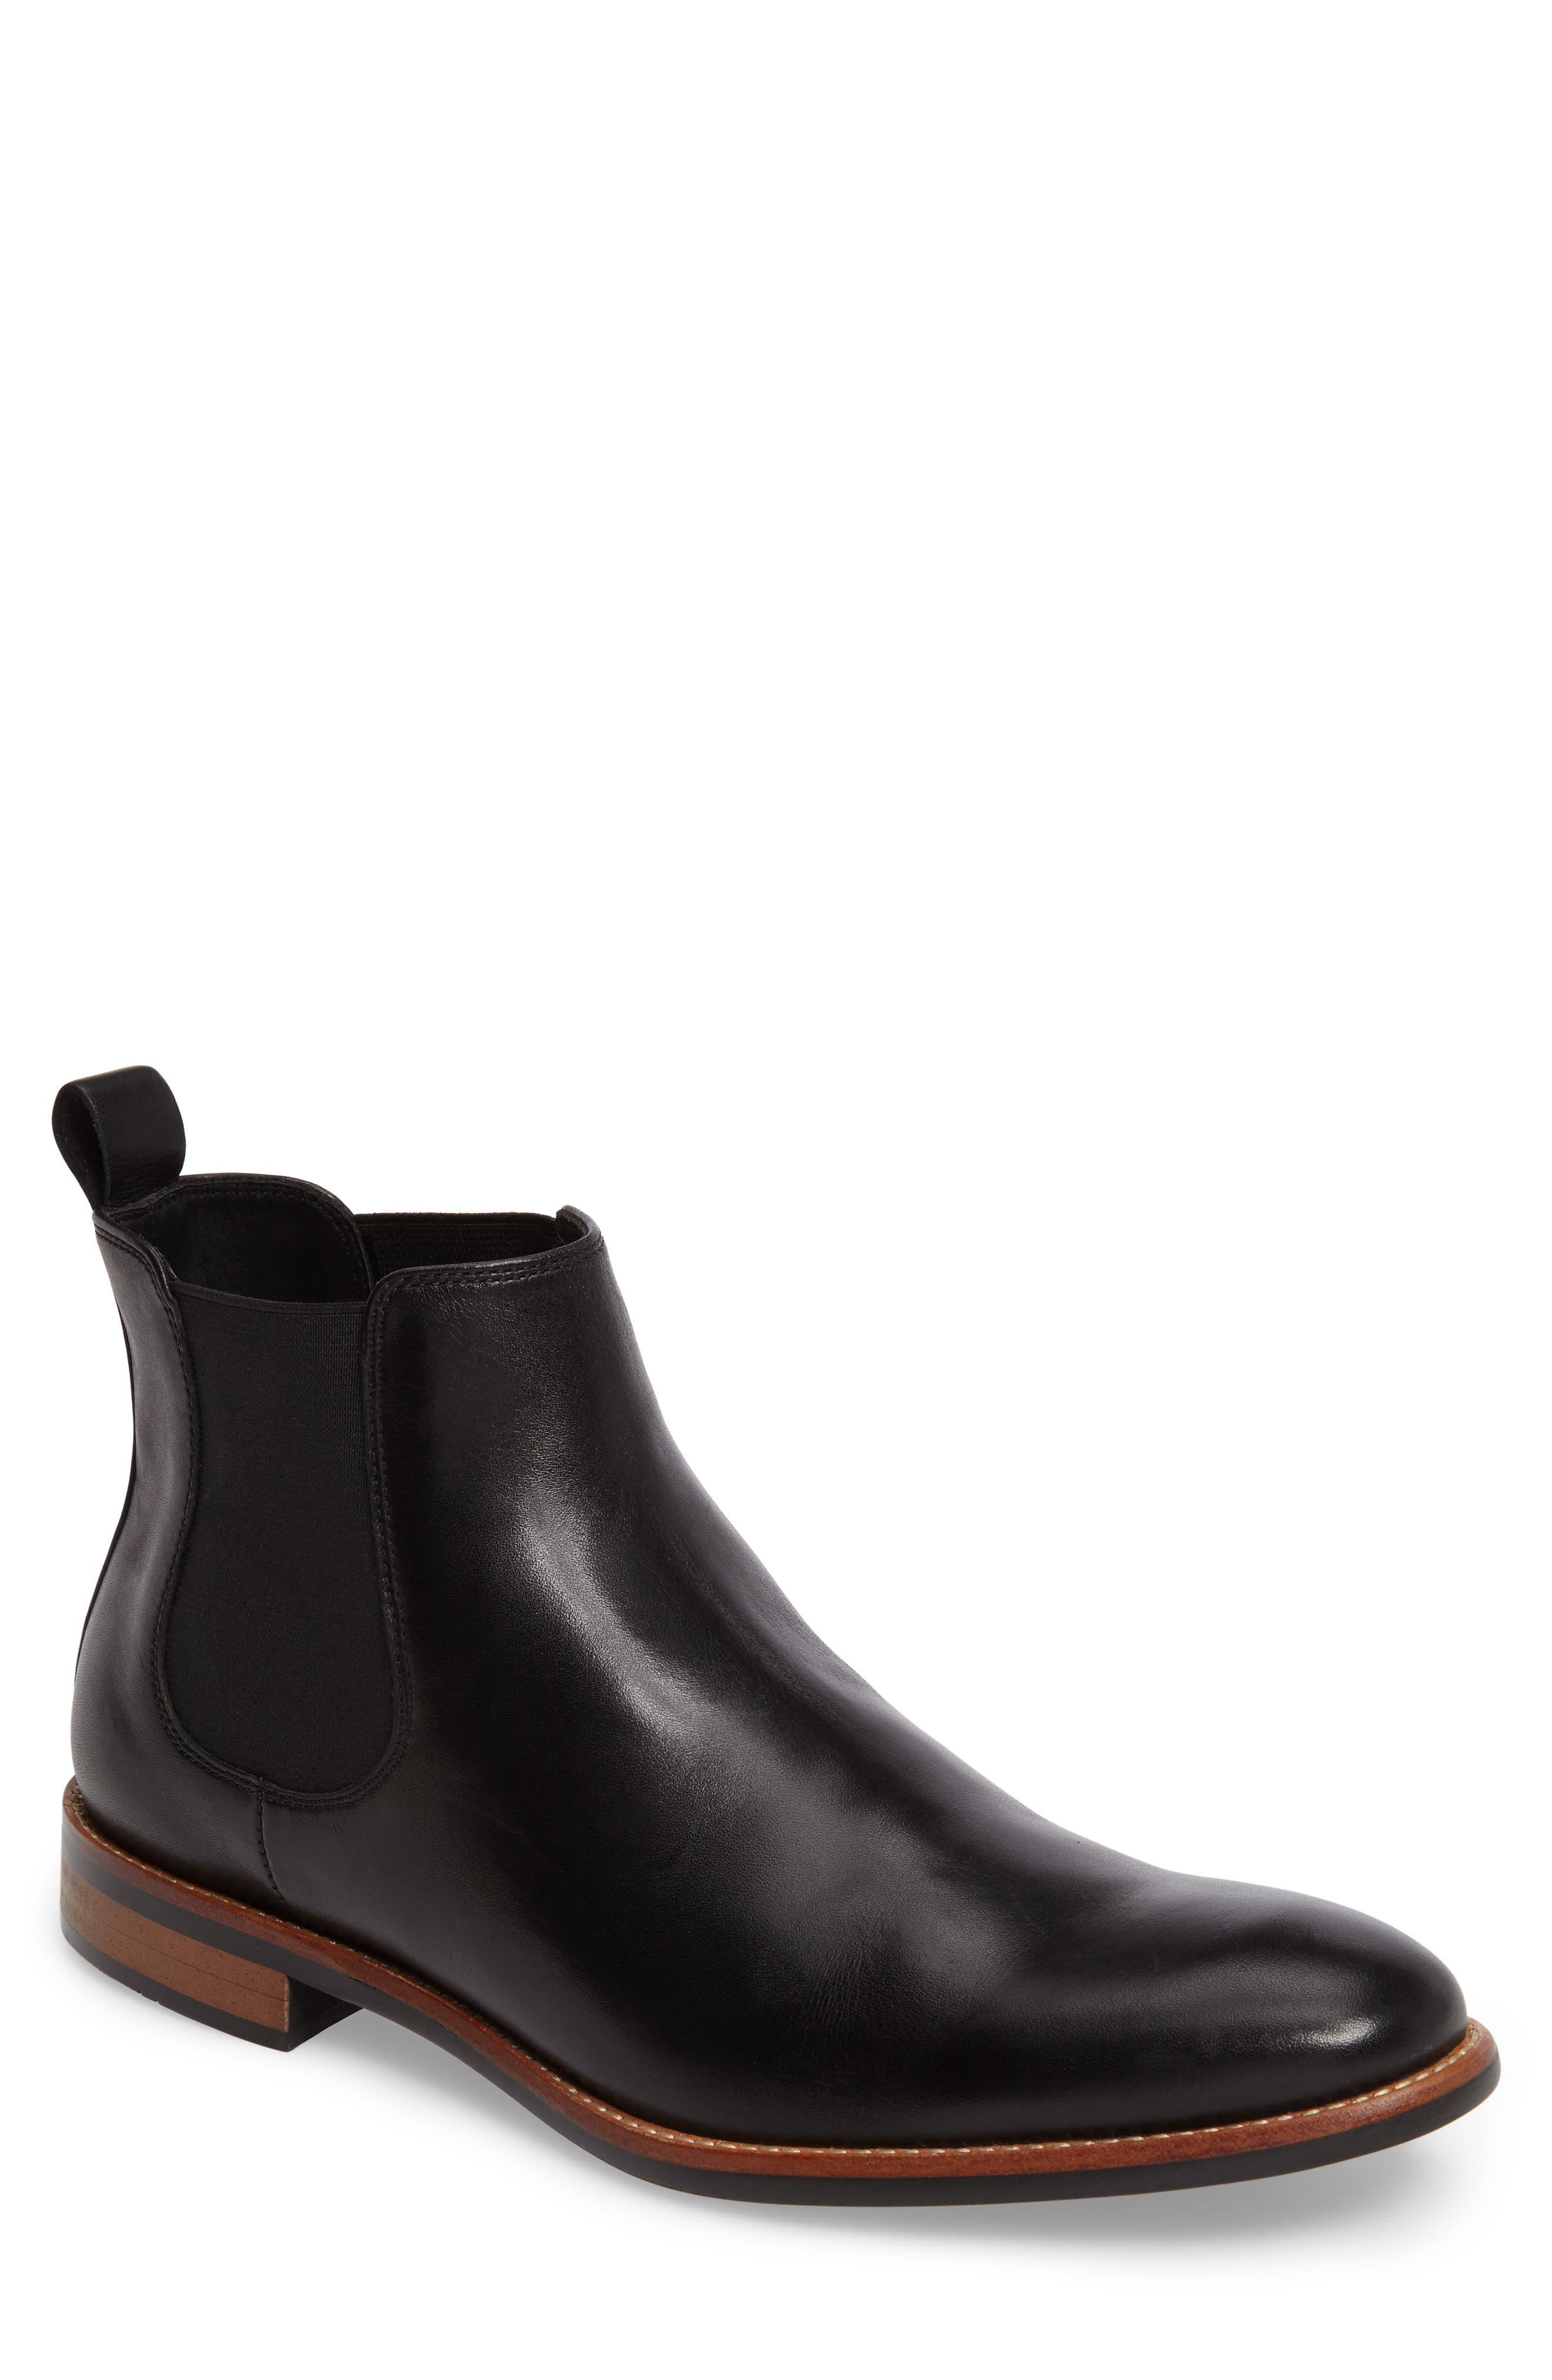 Alternate Image 1 Selected - Gordon Rush 'Wallis' Chelsea Boot (Men)